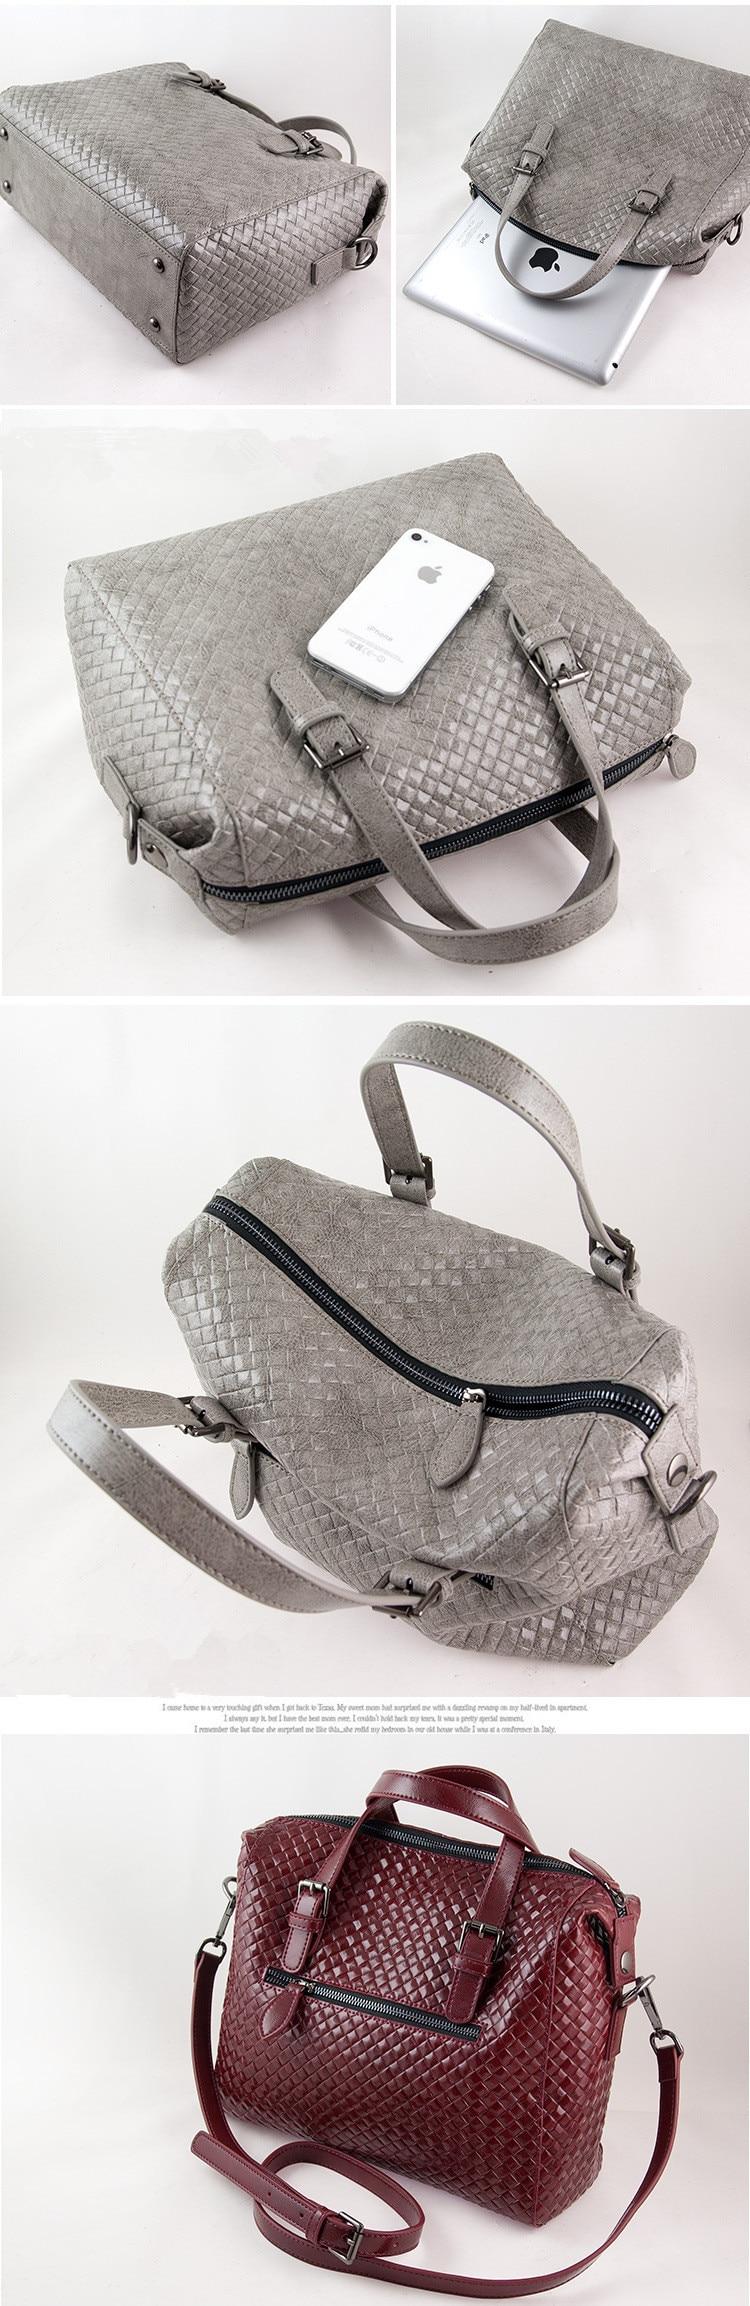 Waterproof Non-Slip Wearable Crossbody Bag fitness bag Shoulder Bag Slime Fruit Picture